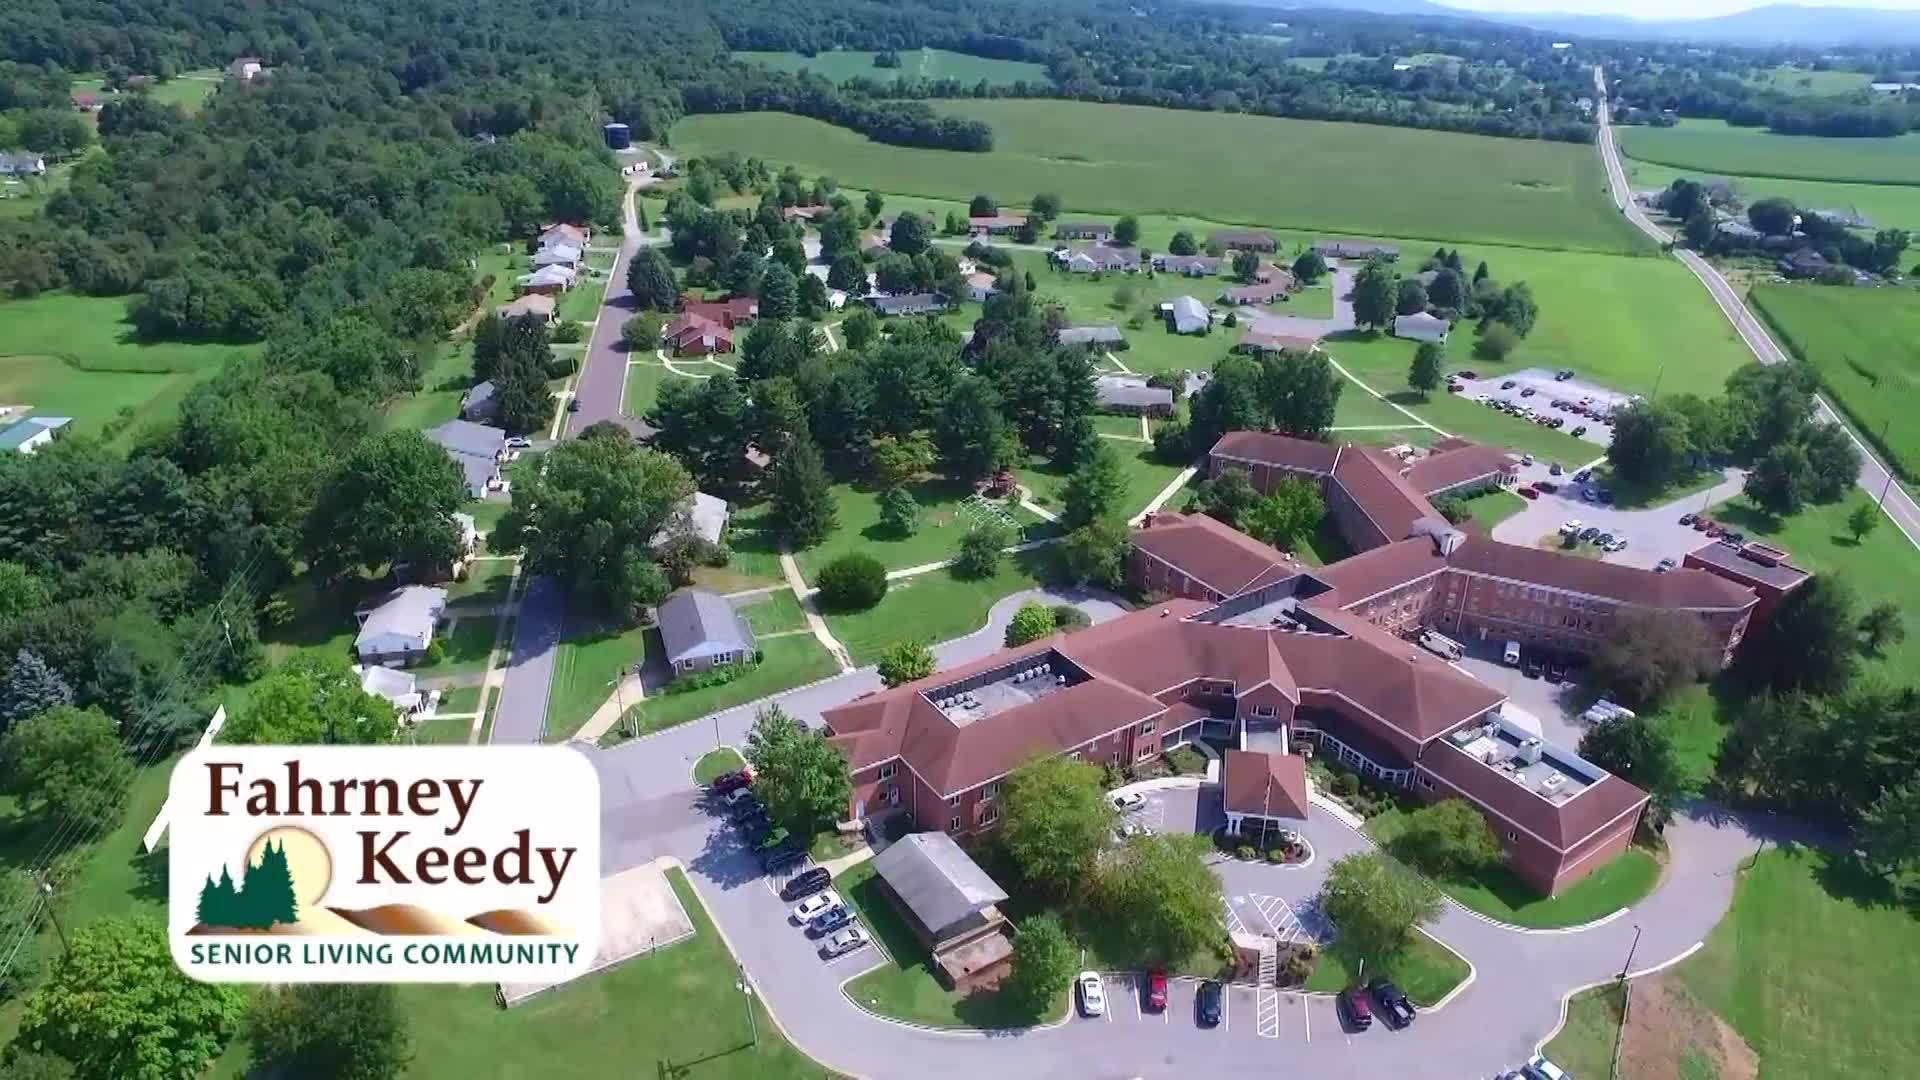 Fahrney Keedy - More to Explore